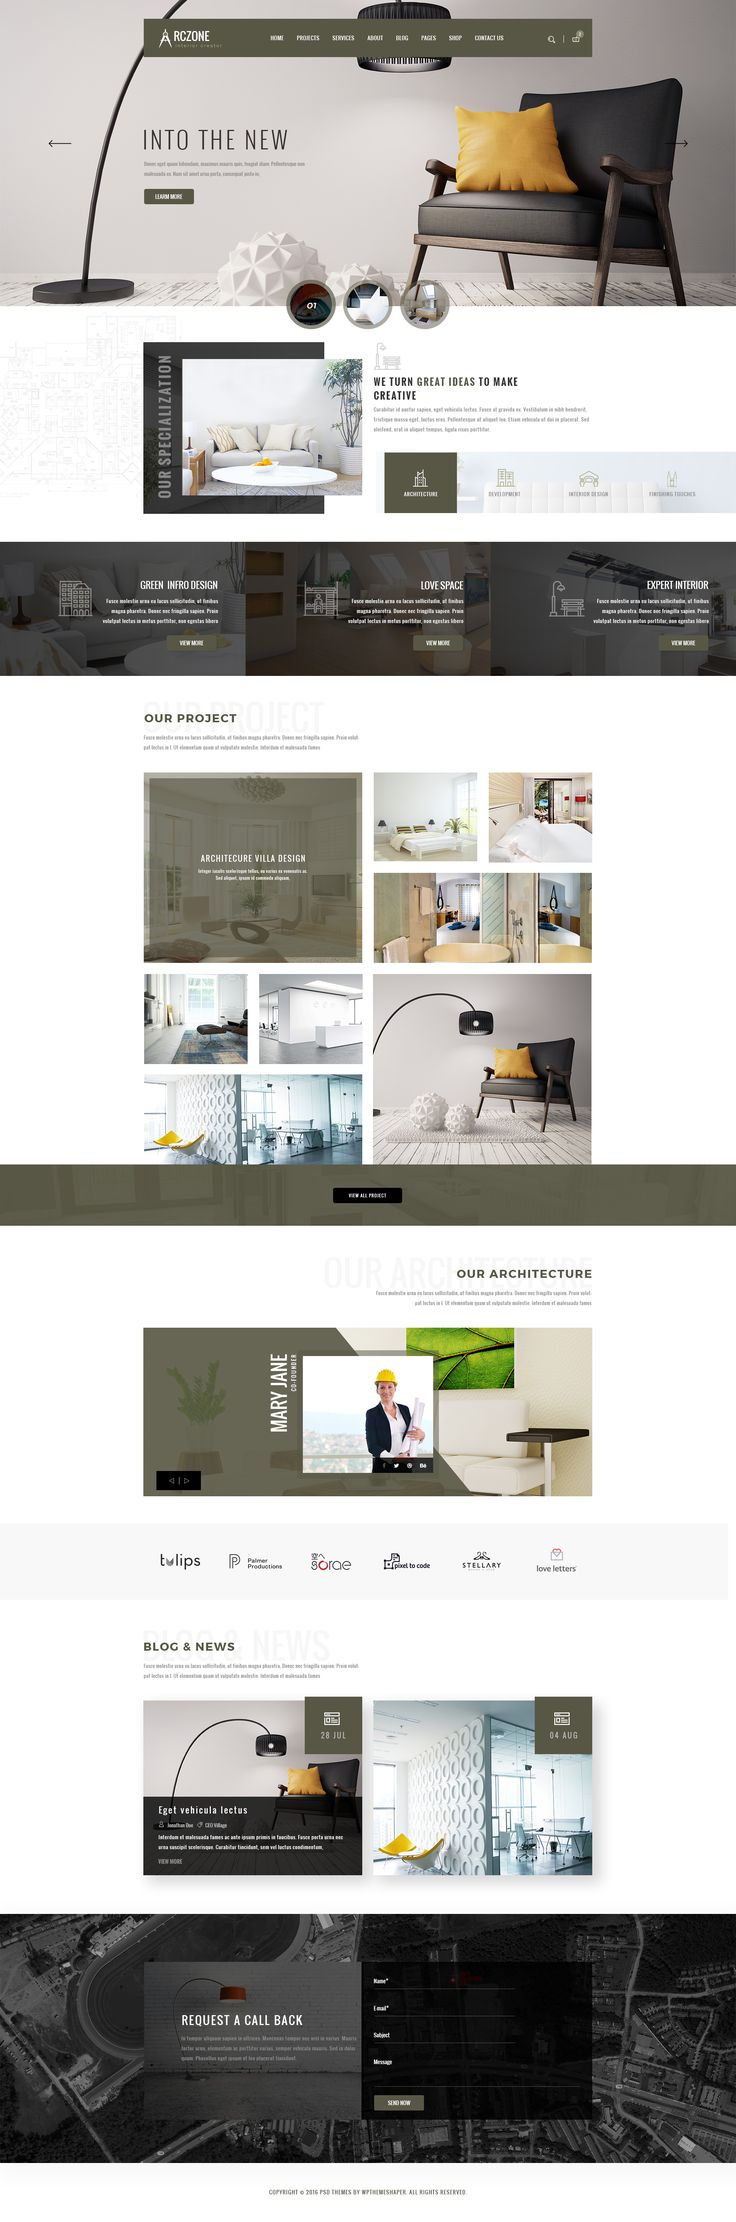 Arczone Interior Design Decor Architecture Business Template Website